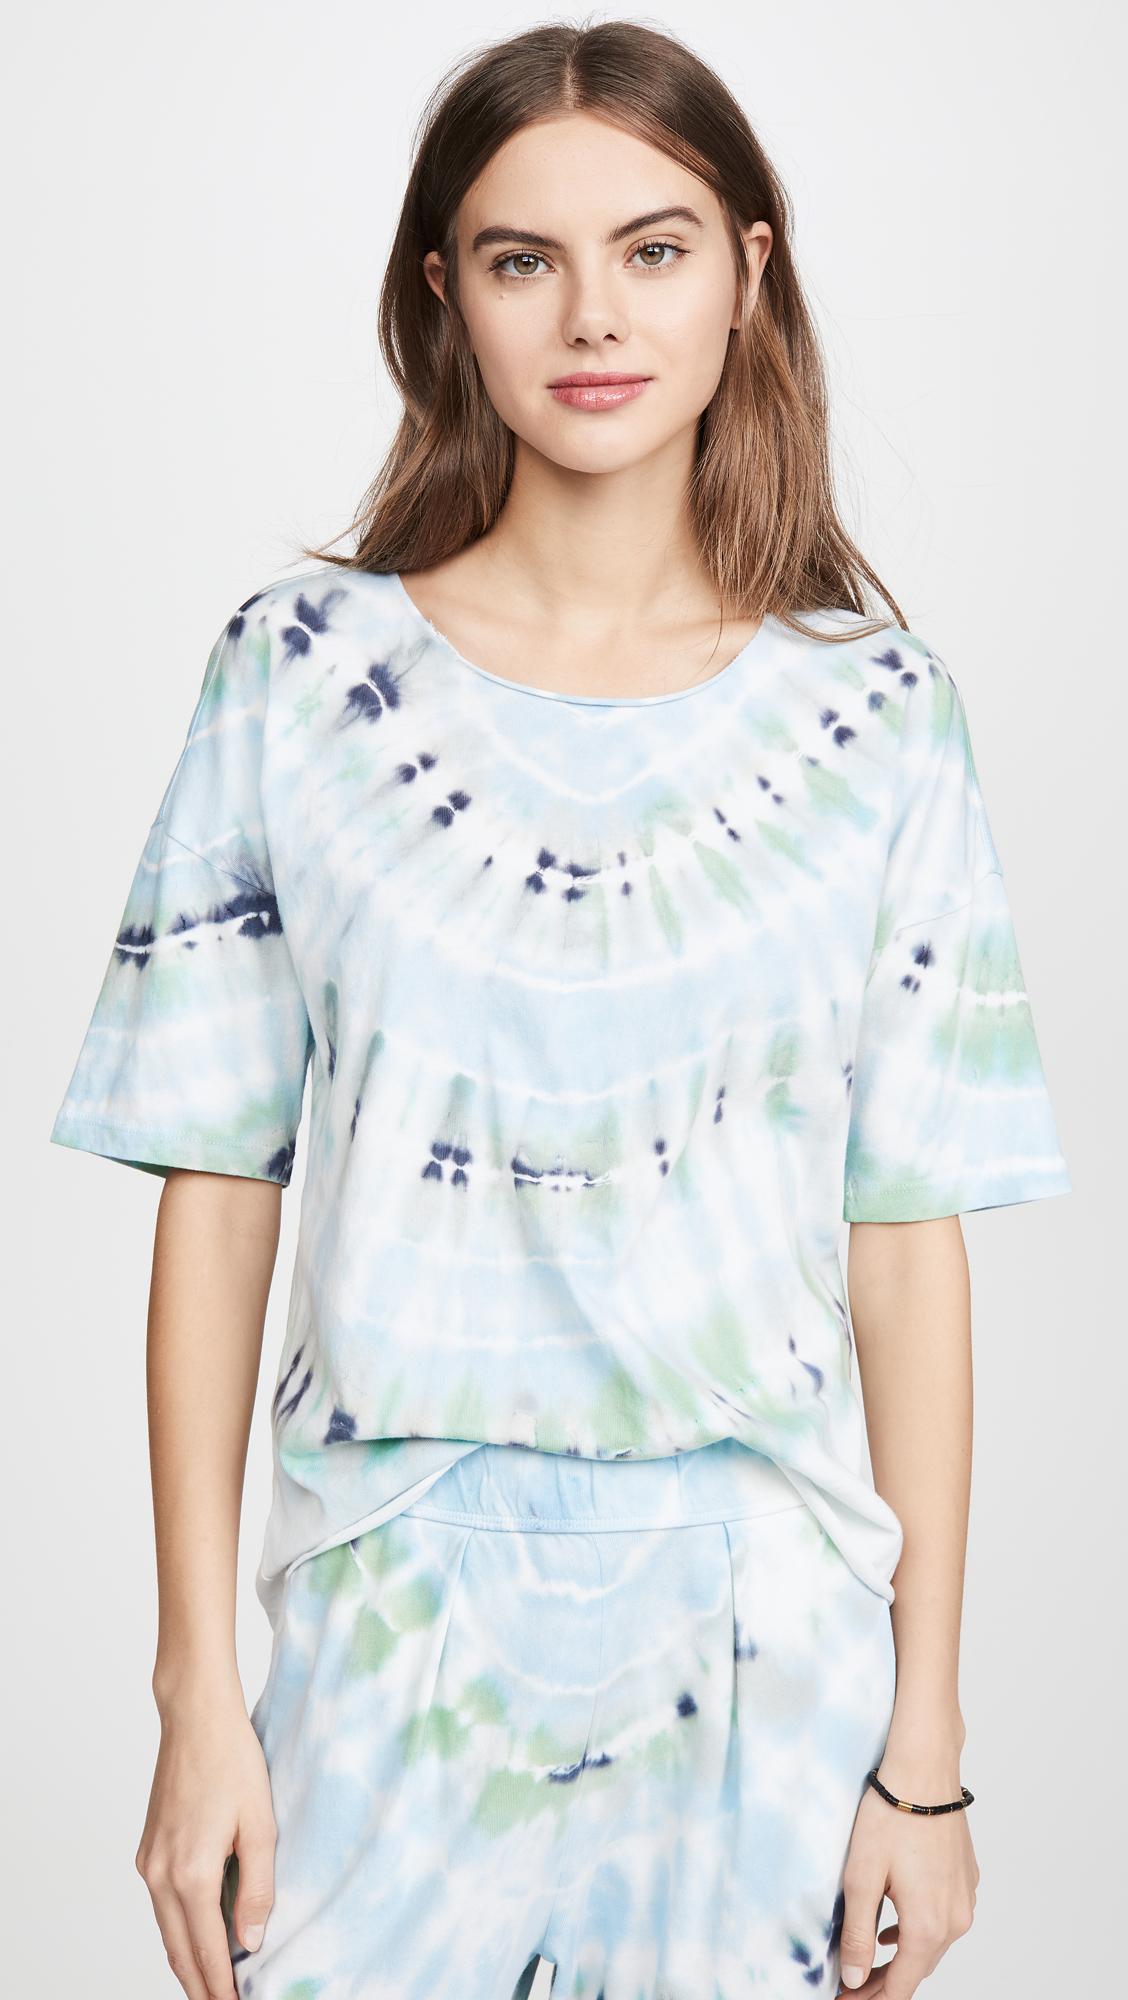 Nina Dobrev's Tie-Dye Matching Set Is Absolutely My Next Purchase 28